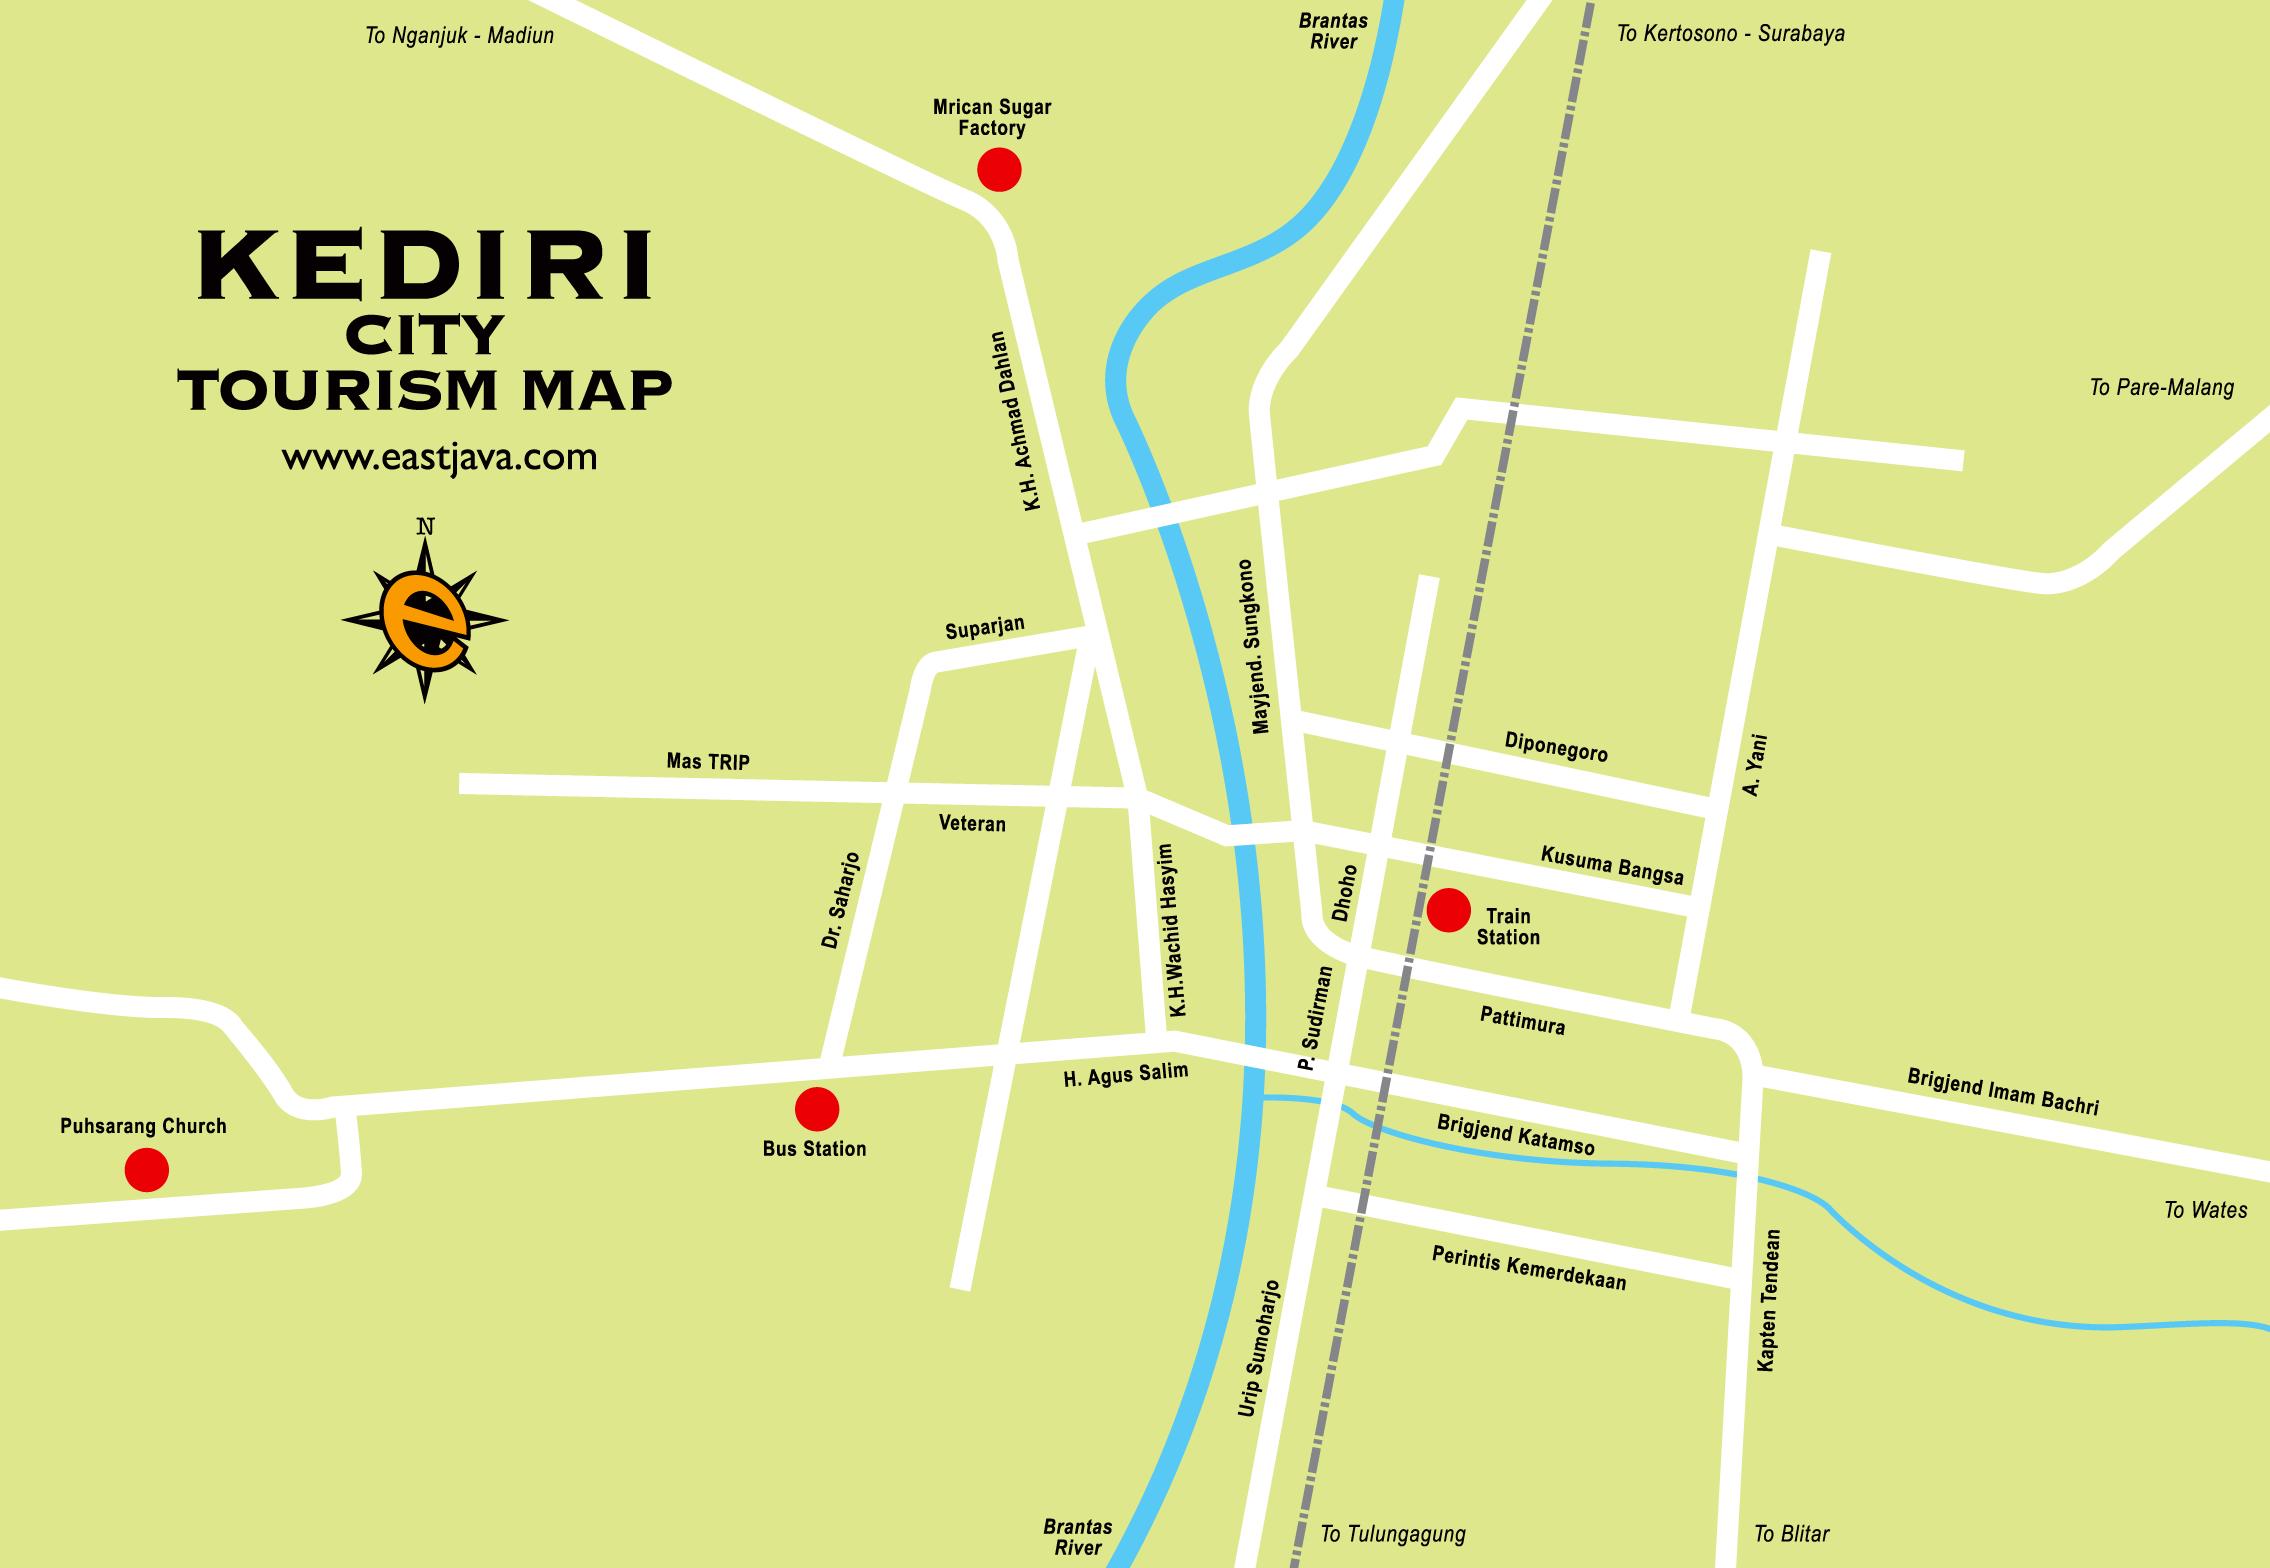 Kediri City Tourism Map Reflection Beauty Nature Presents Google Alun